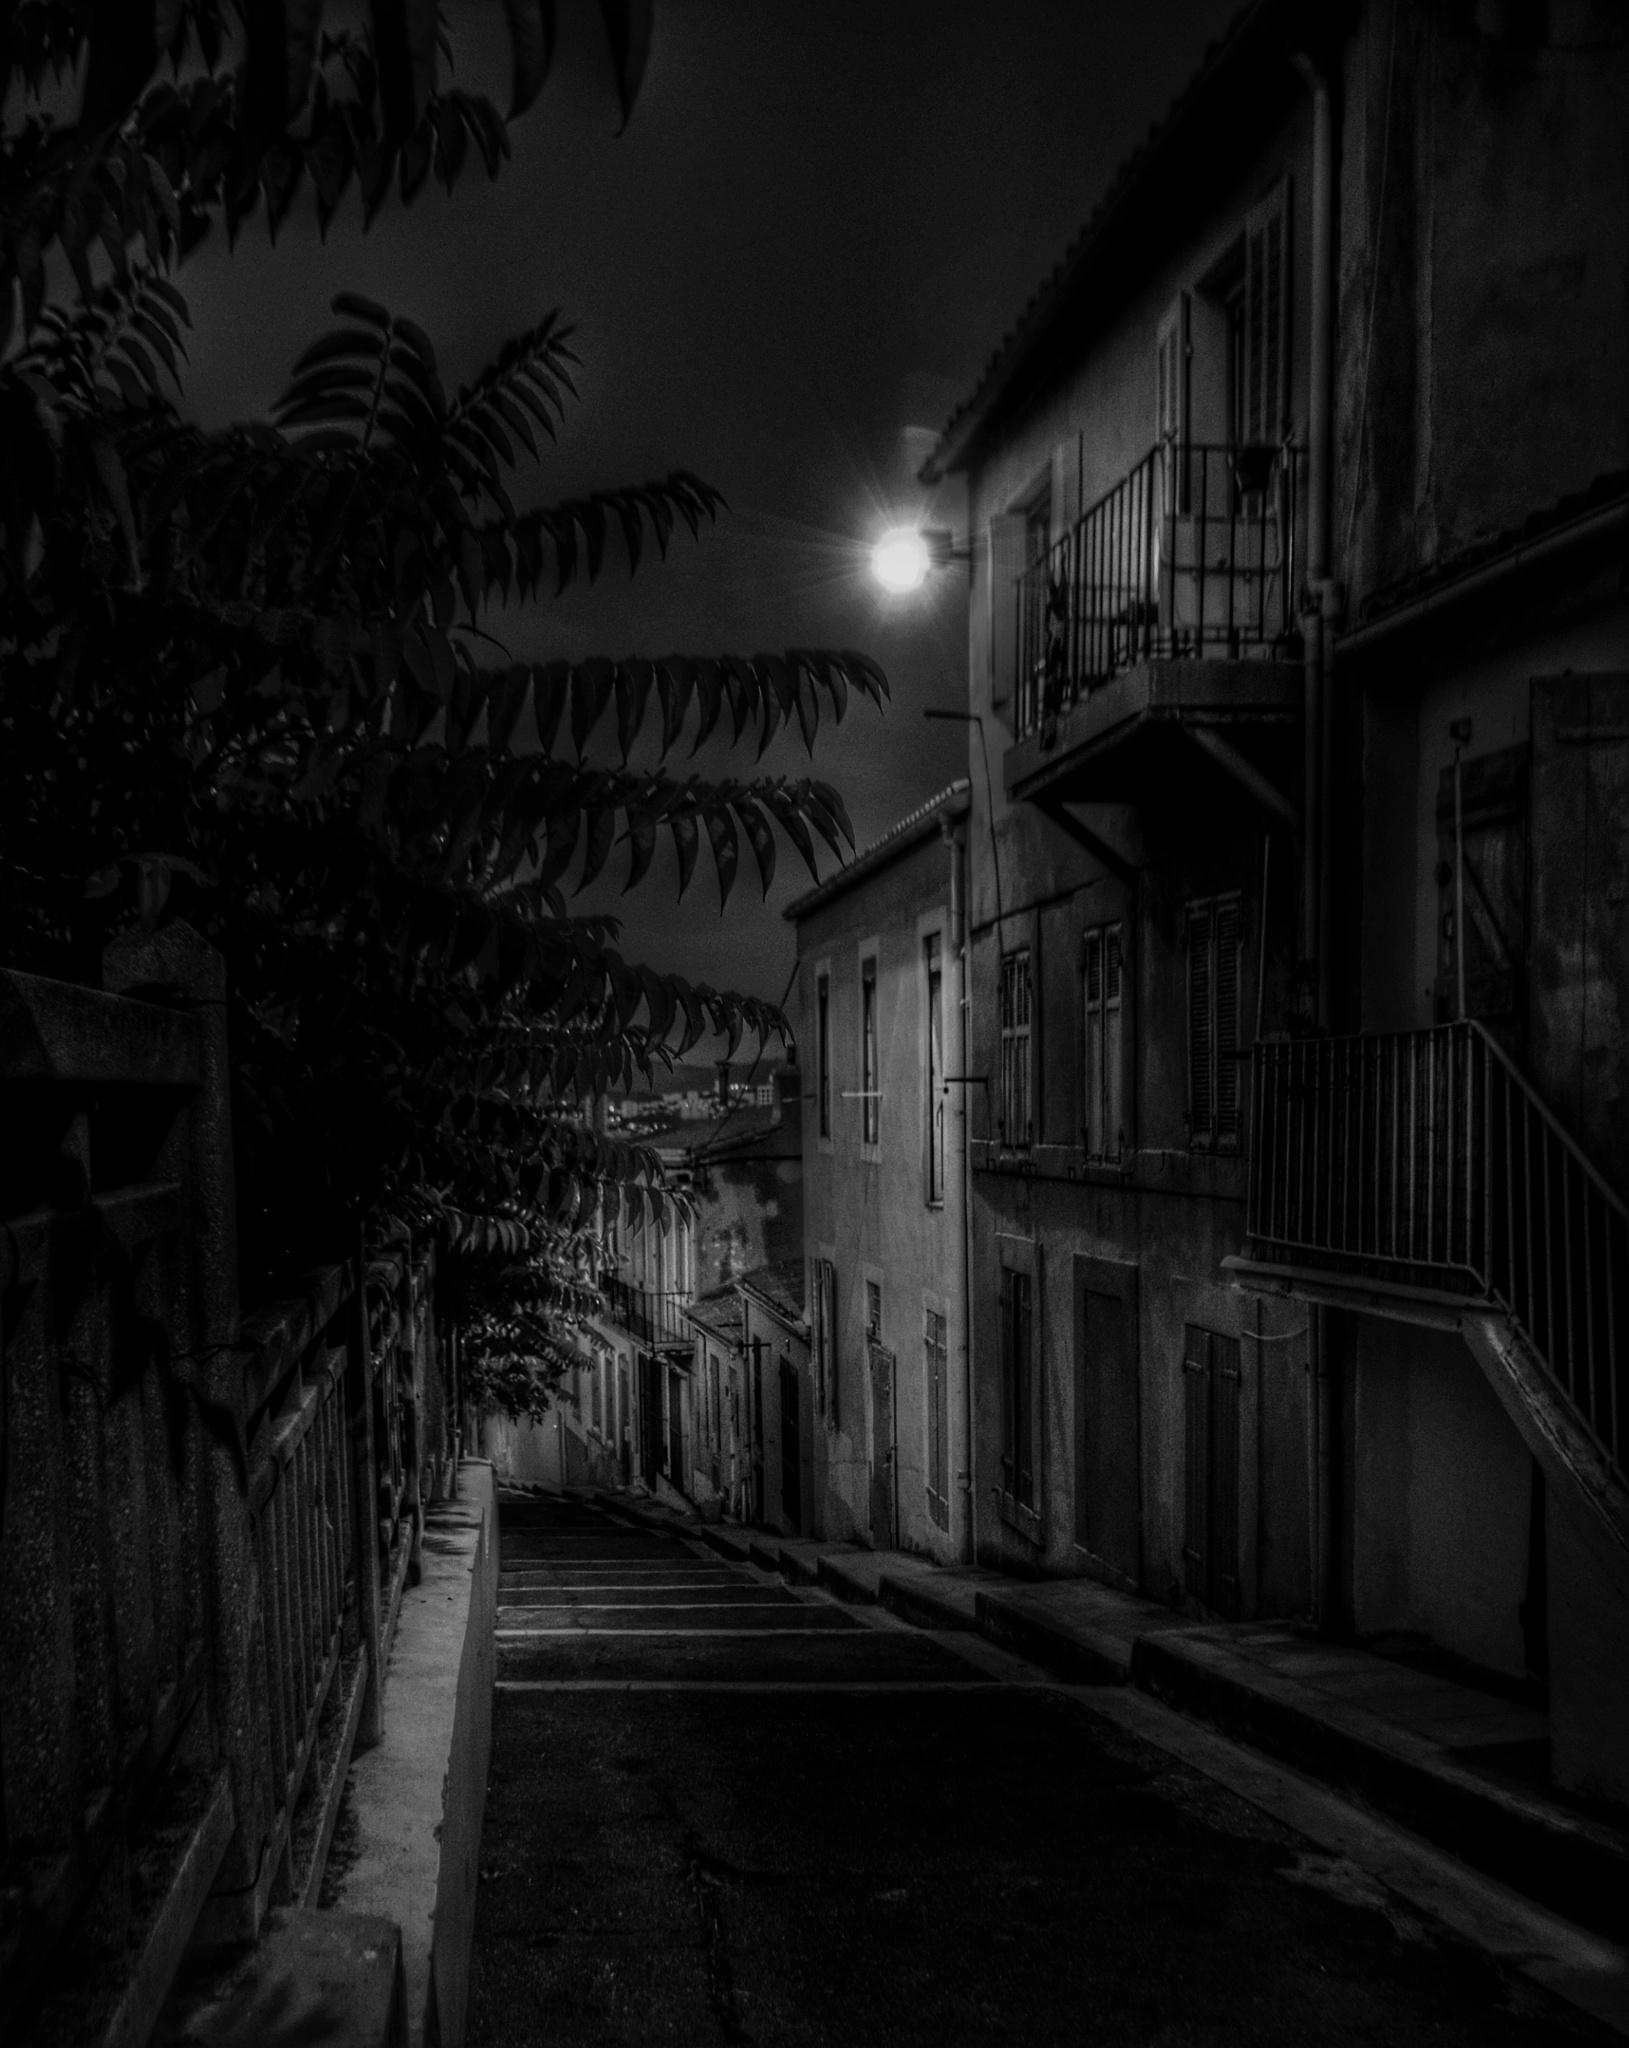 By night by Charlottess